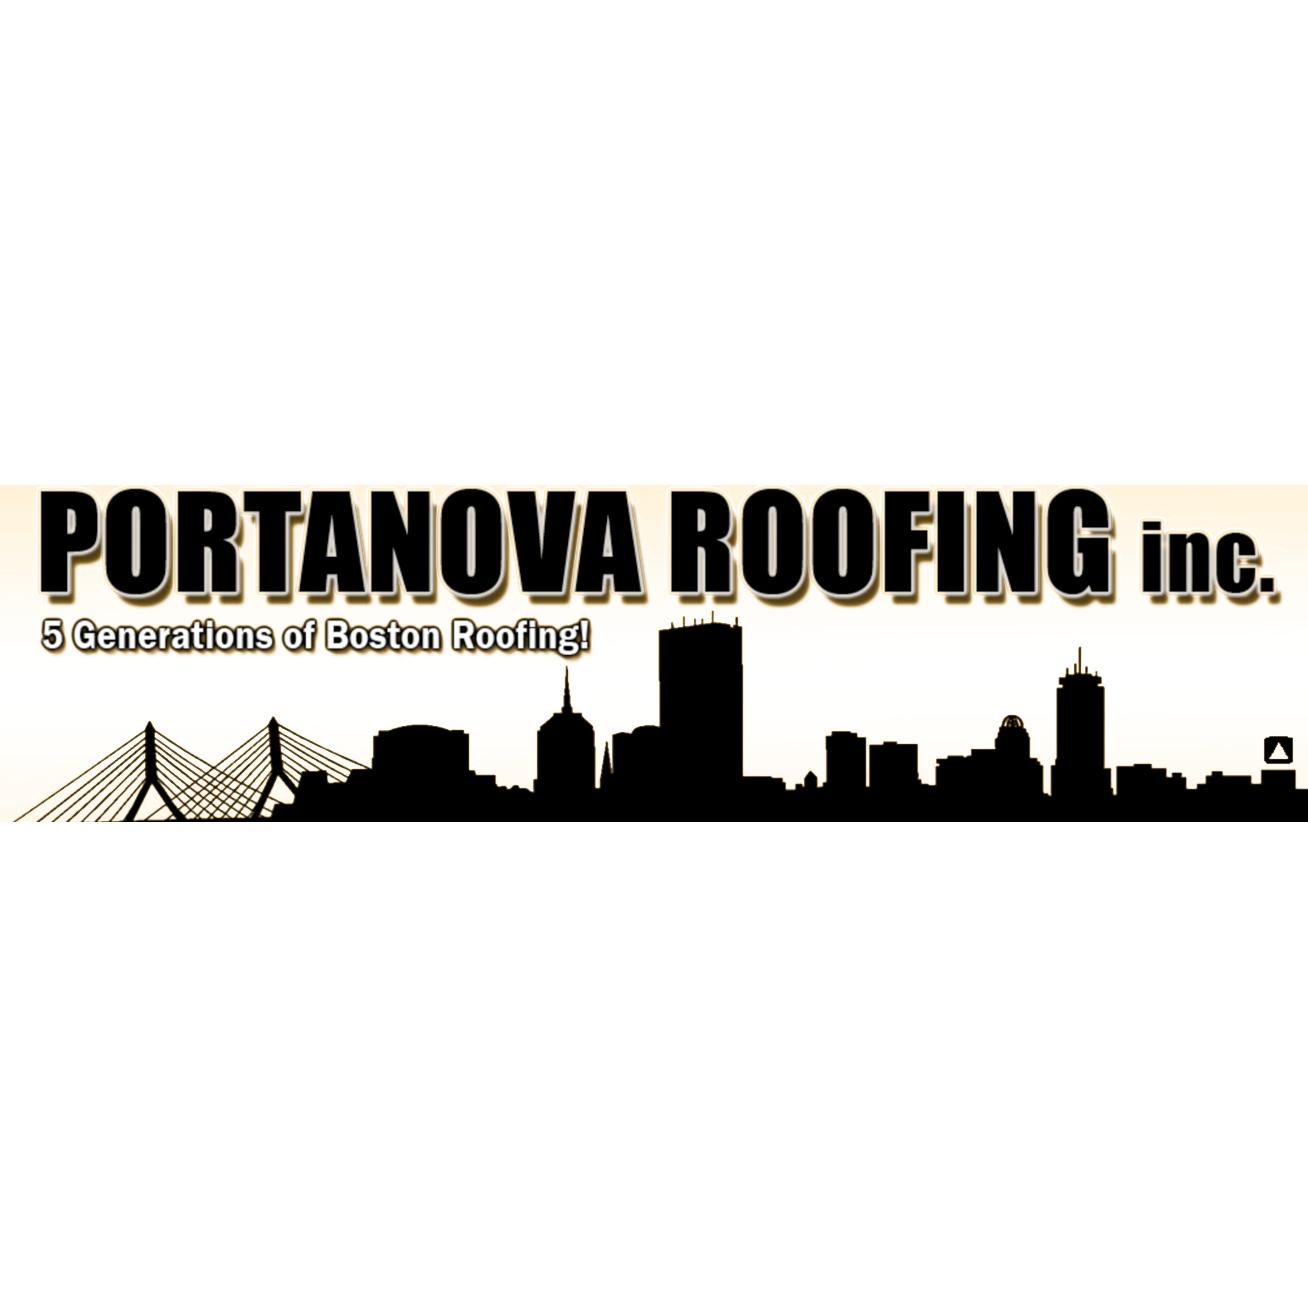 Portanova Roofing Inc.